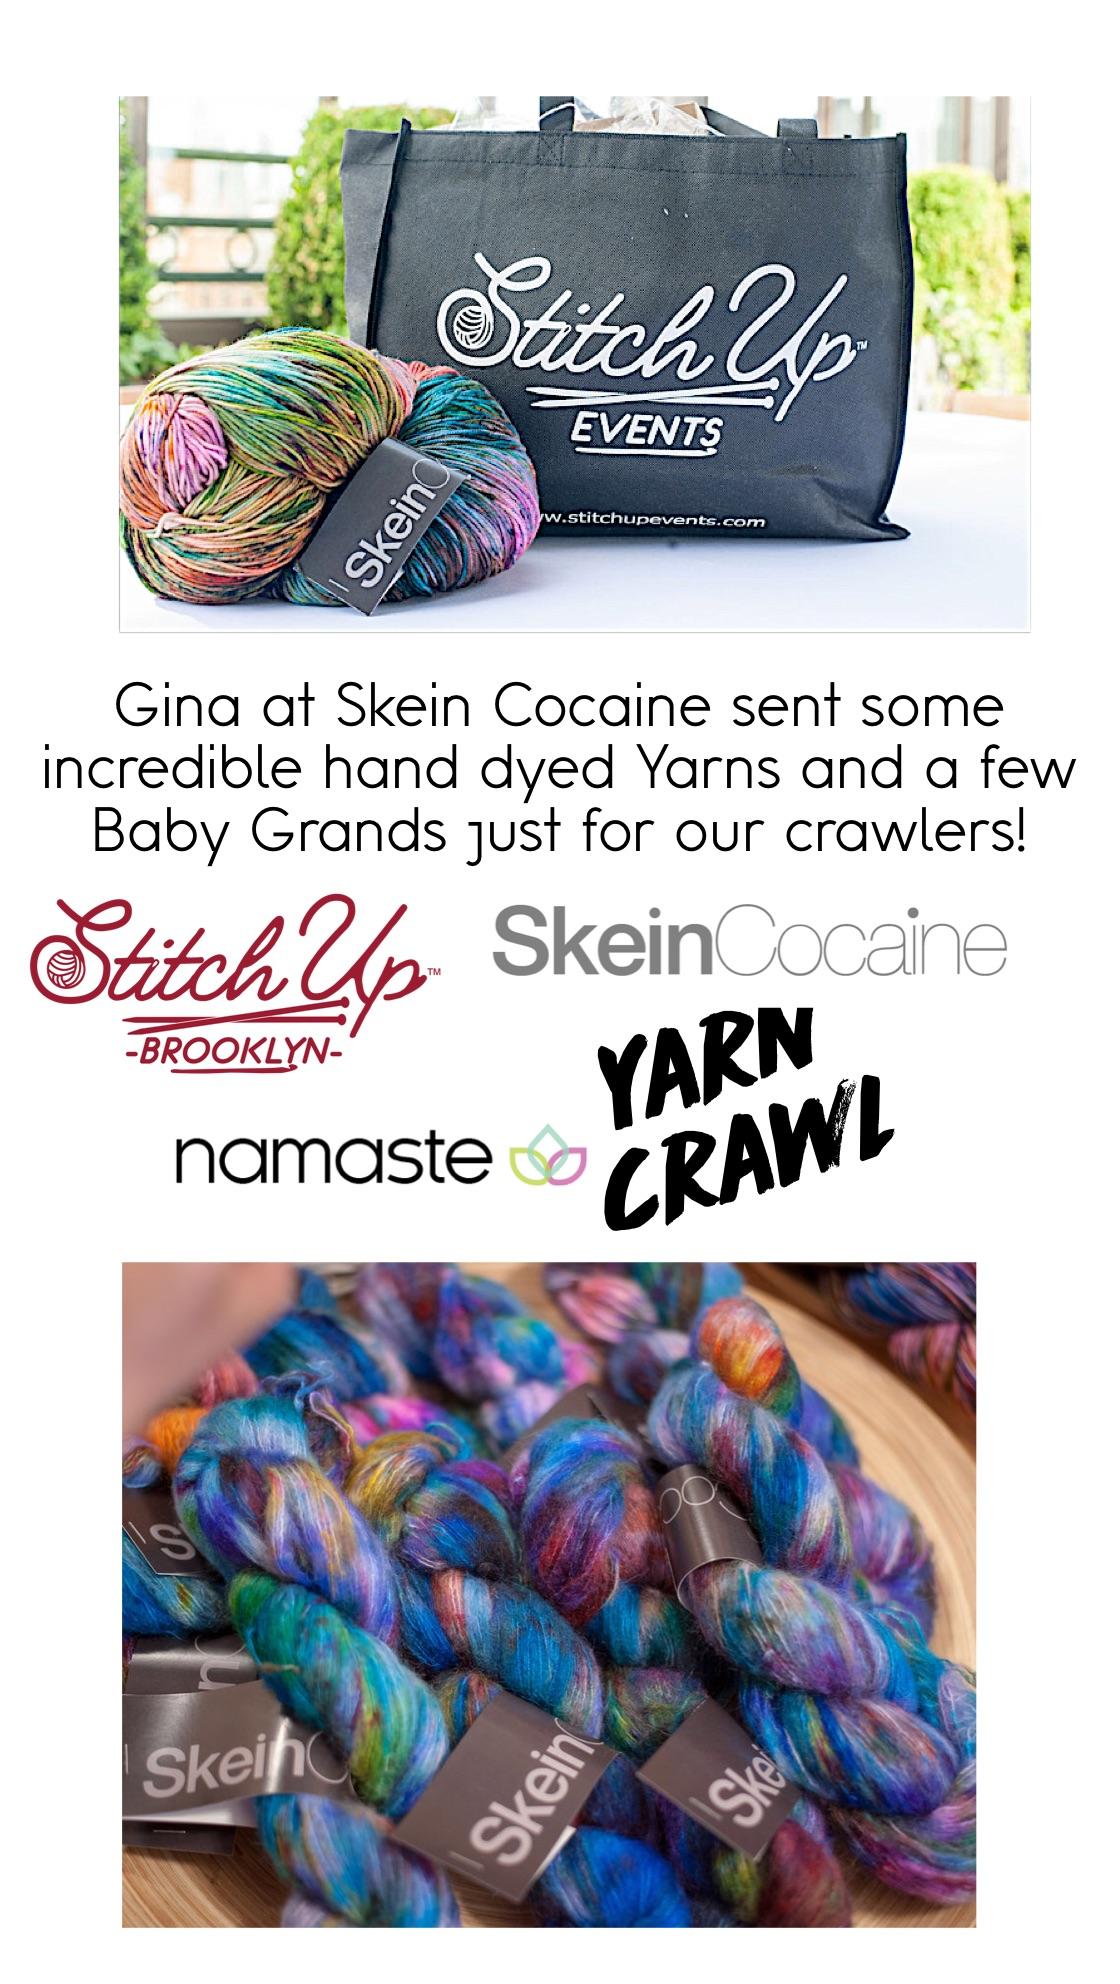 Yarn crawl-5.jpg